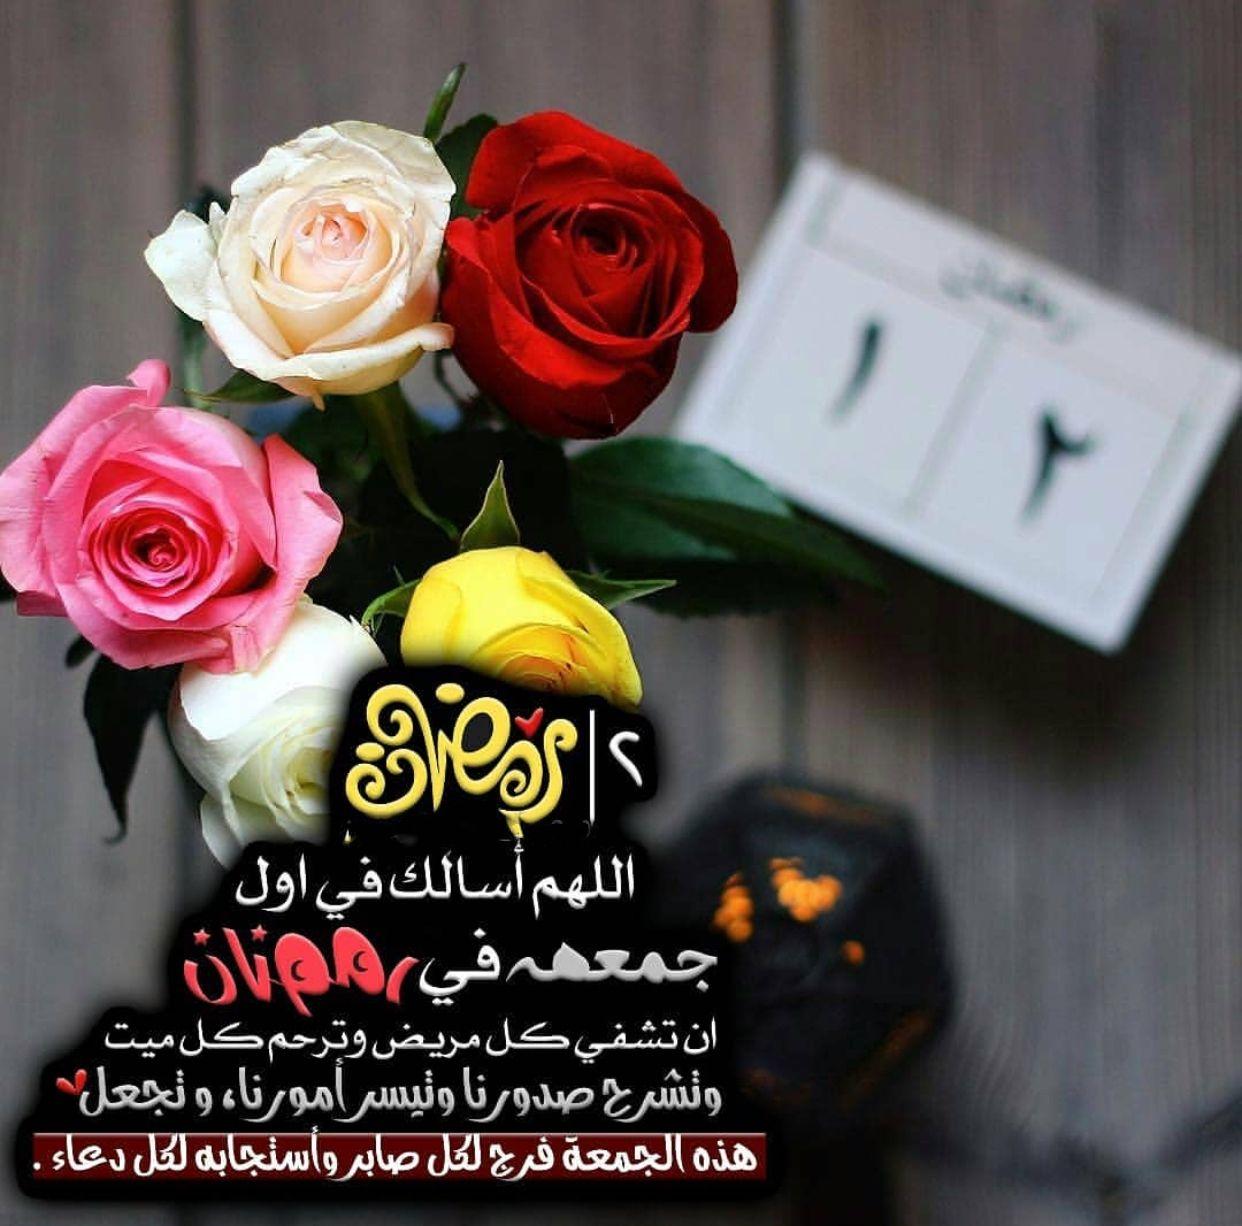 Pin By بنت محمد On ادعية رمضان Ramadan Romantic Love Quotes Quran Quotes